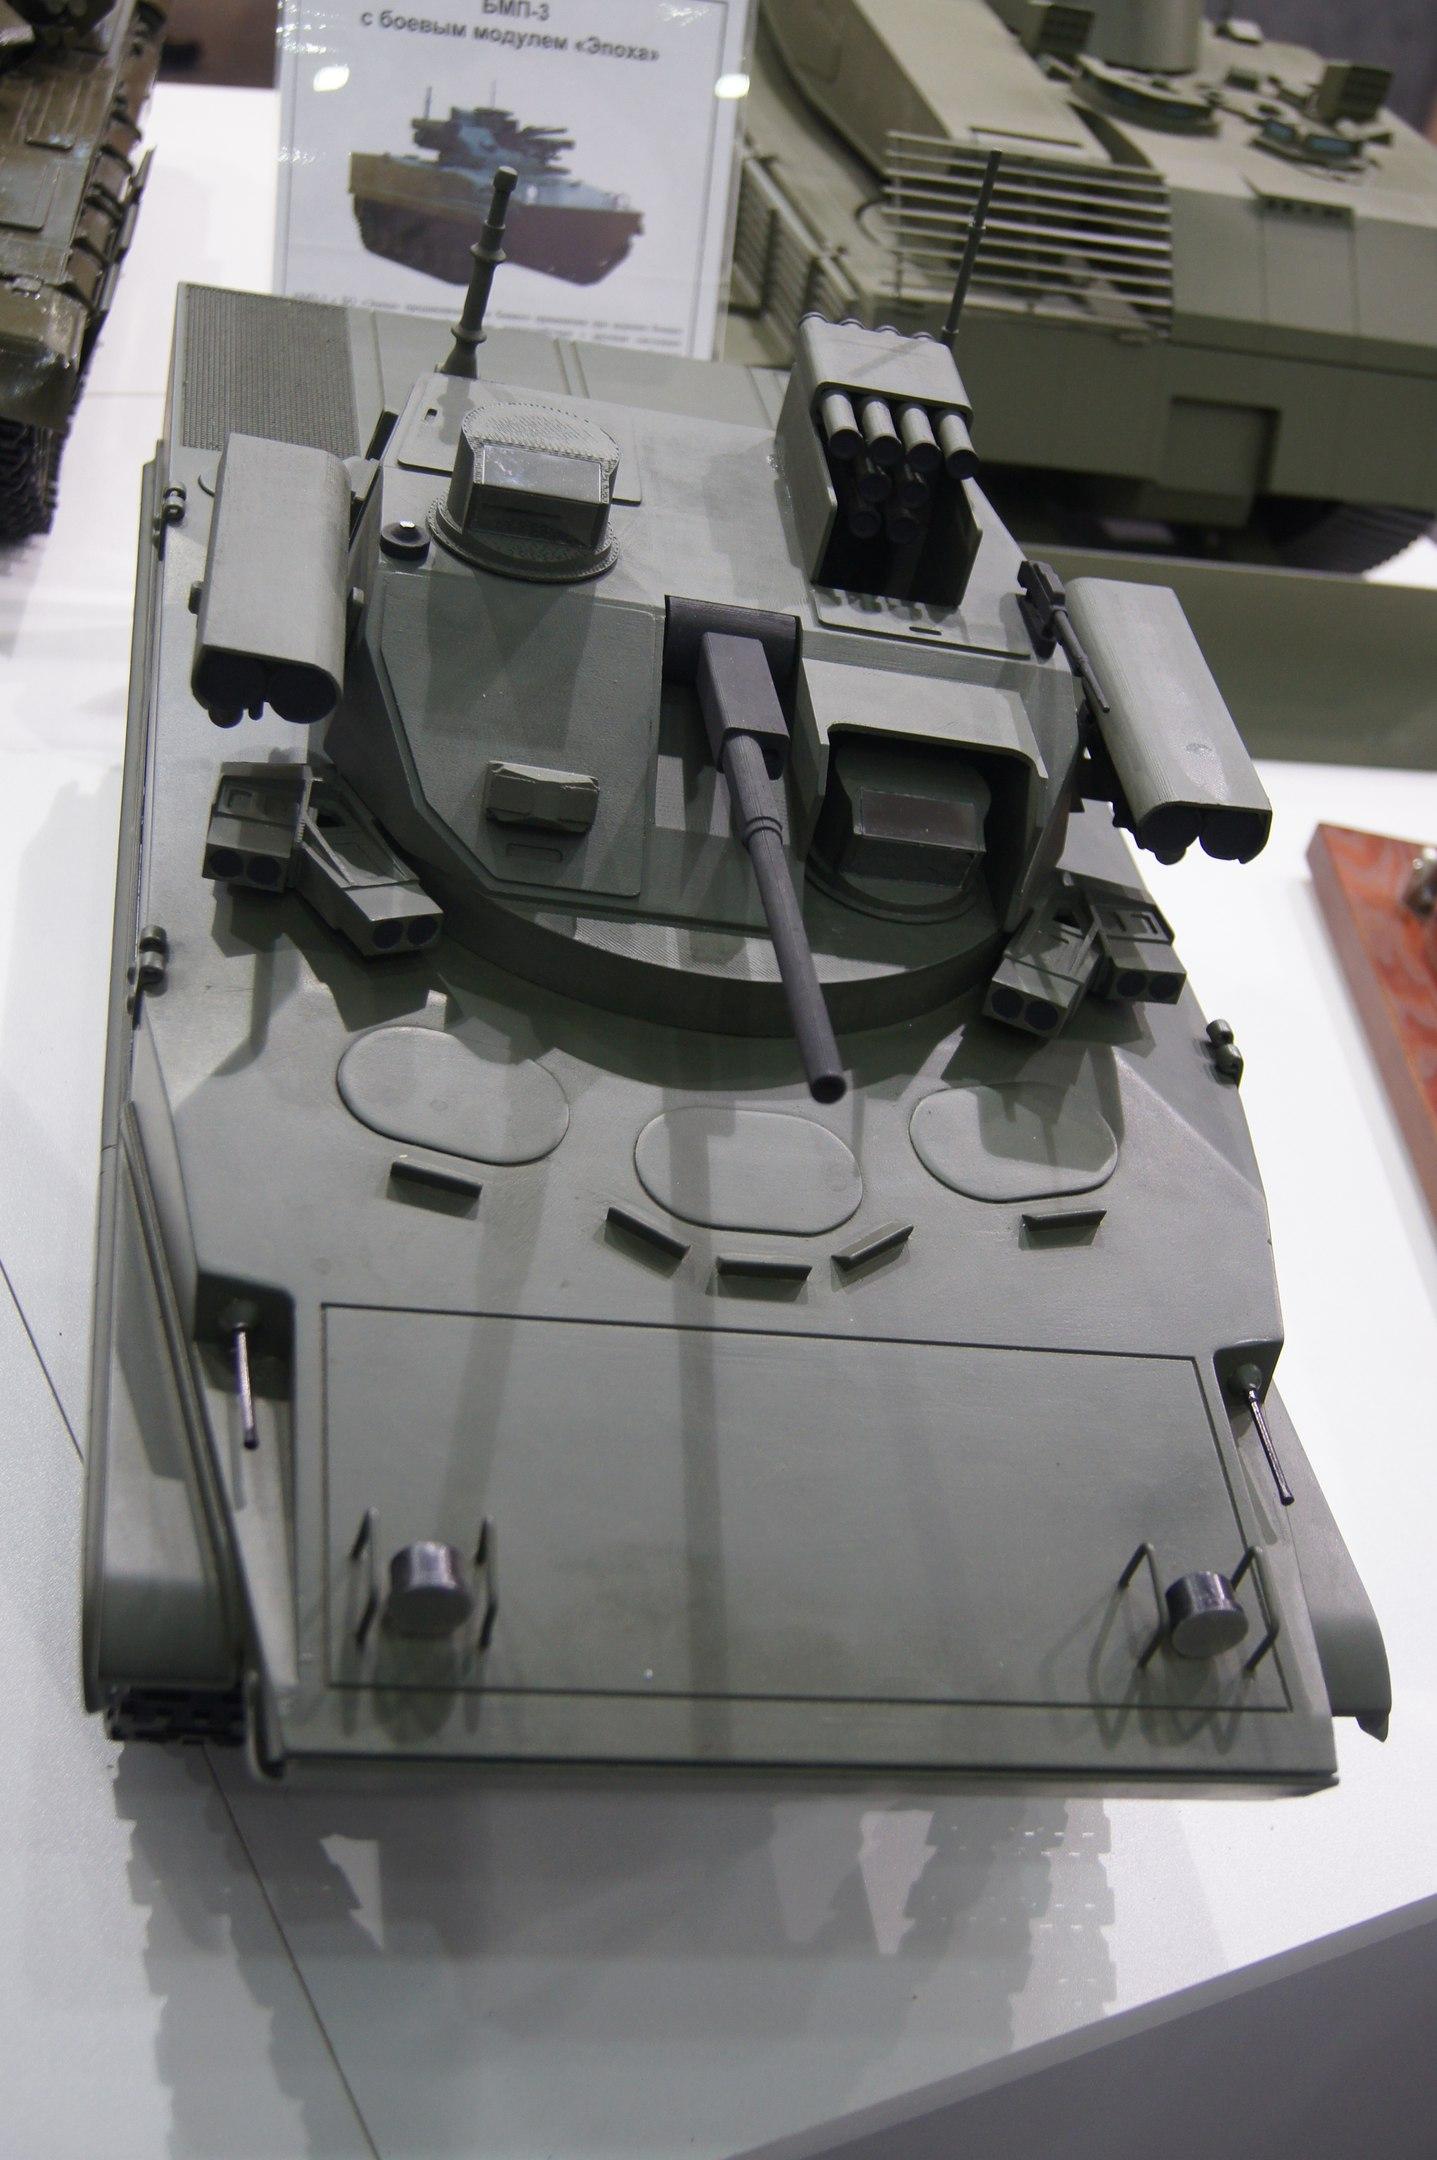 Armija-Nemzetközi haditechnikai fórum és kiállítás - Page 3 NcgHOfoJCbU